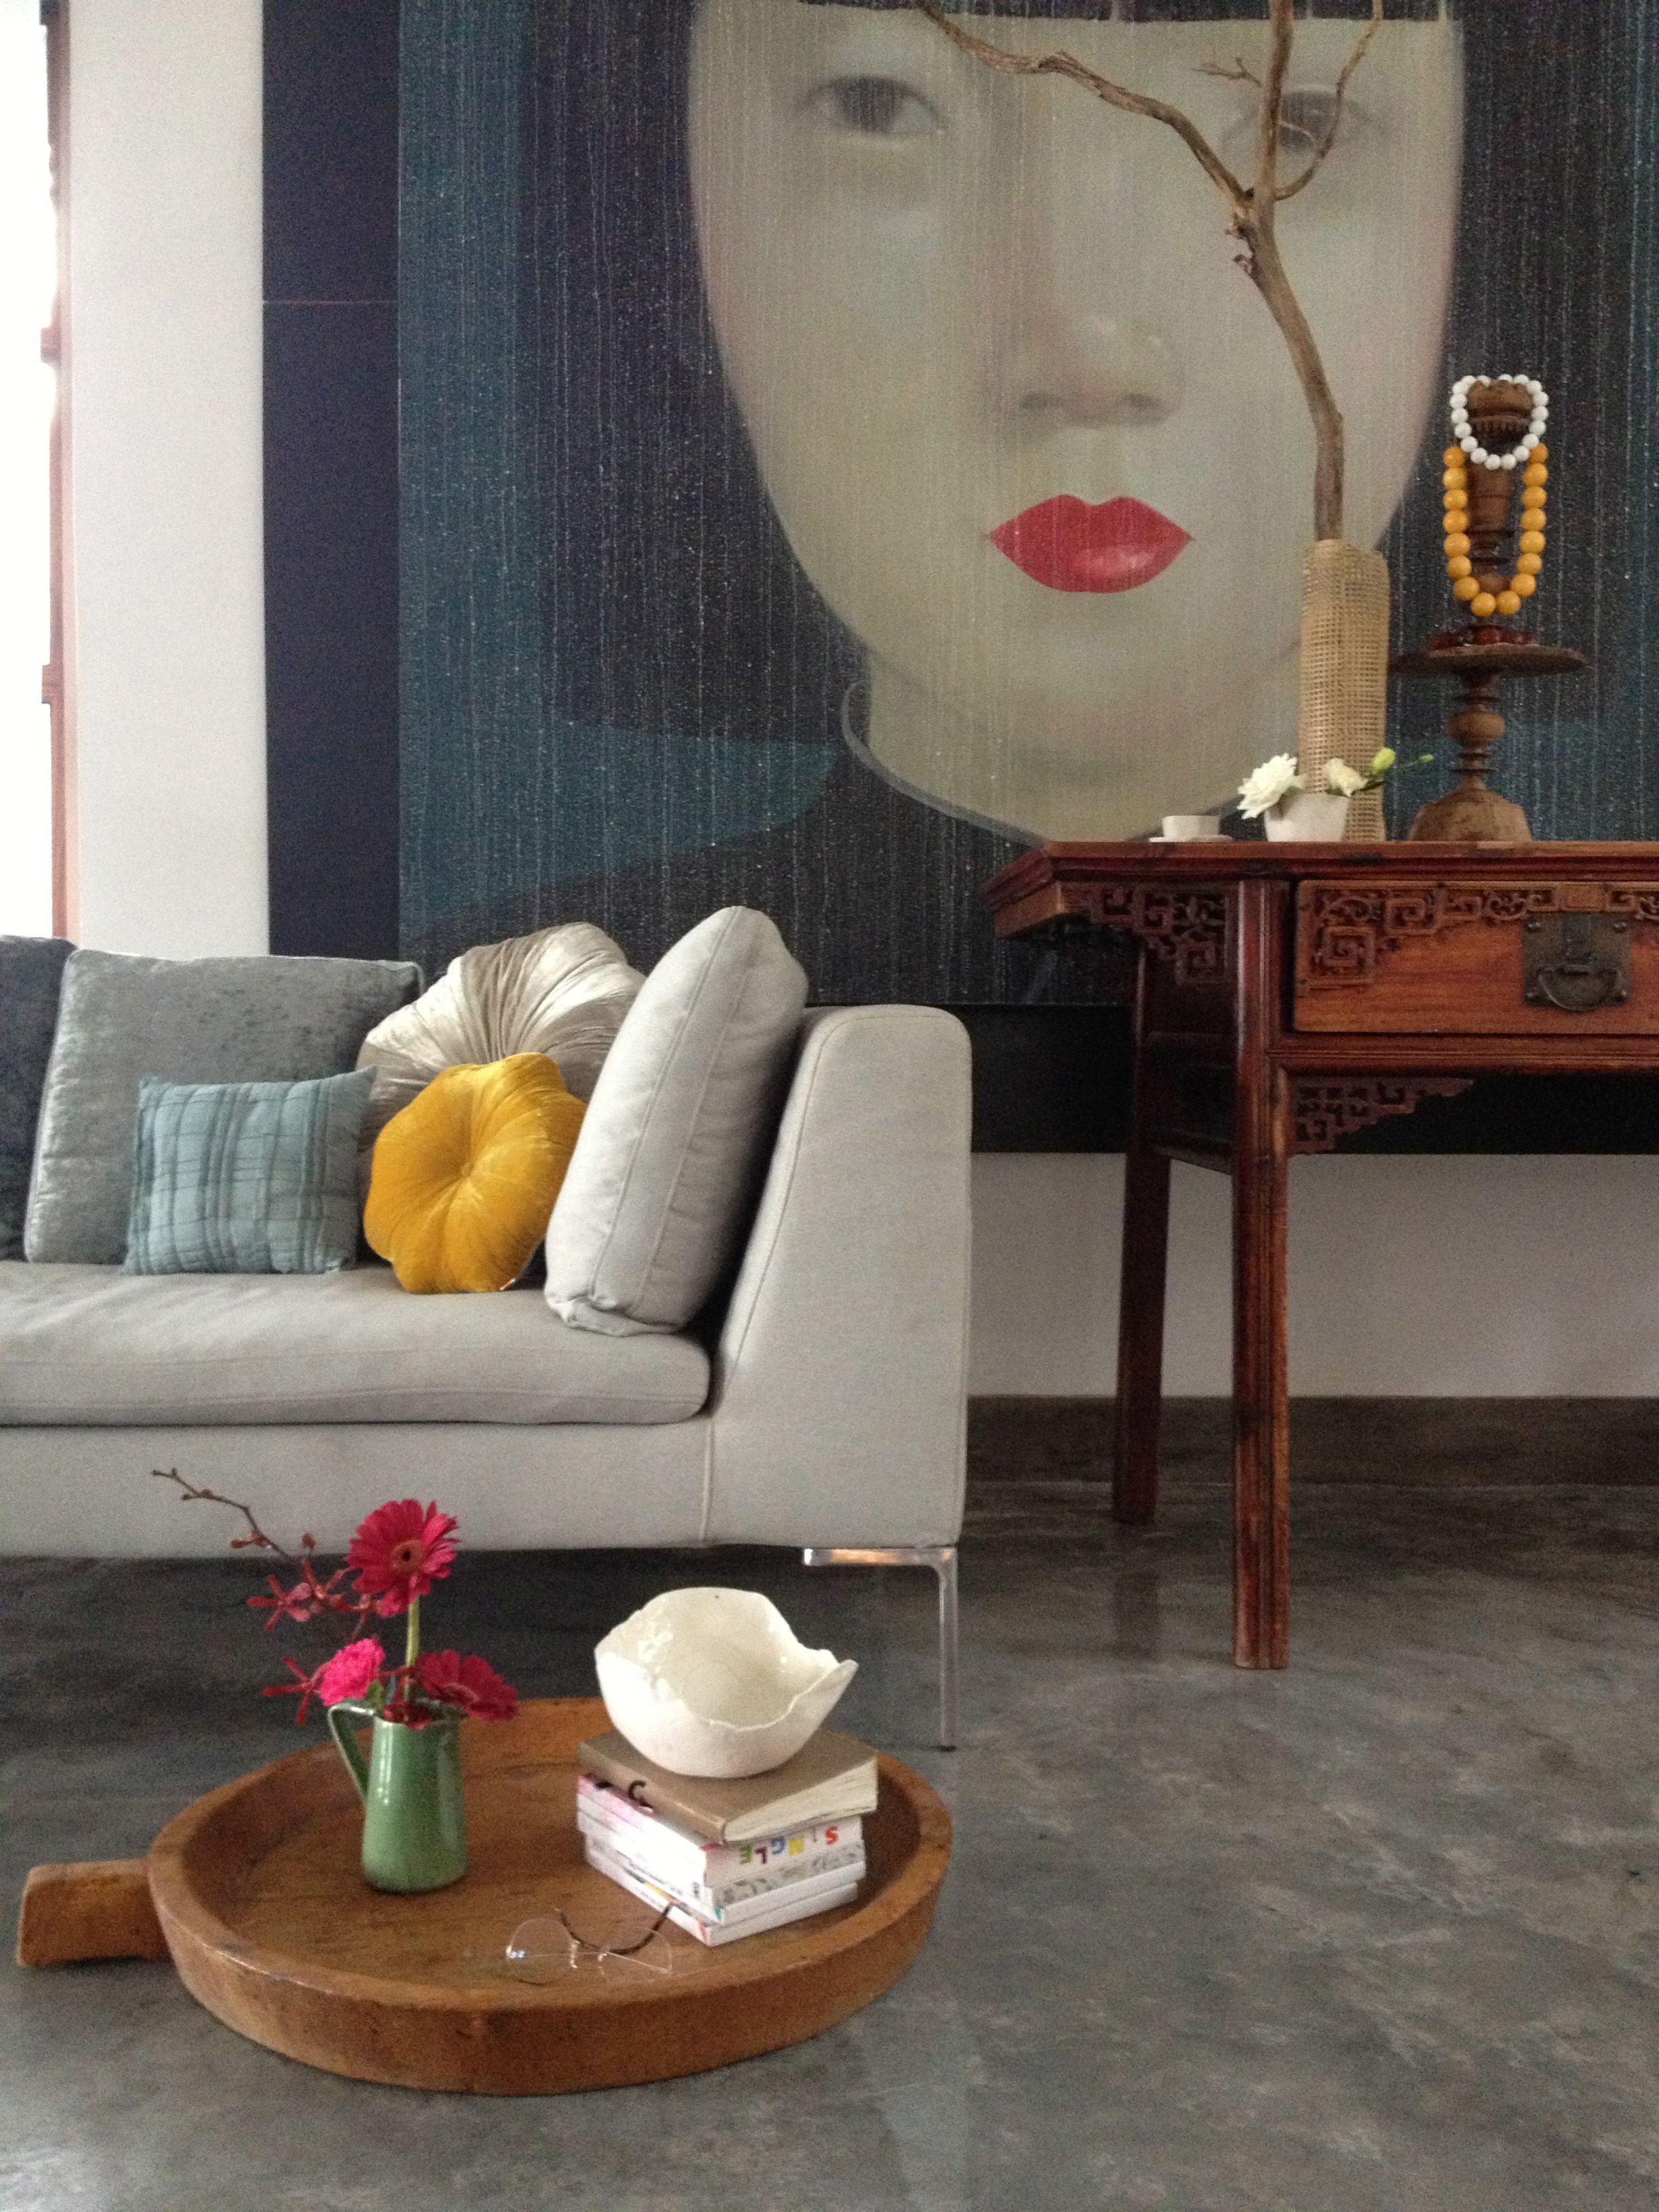 My home for photoshoot wallpaper magazine painting from thai artist attasit wohnideen - Asiatische wohnideen ...